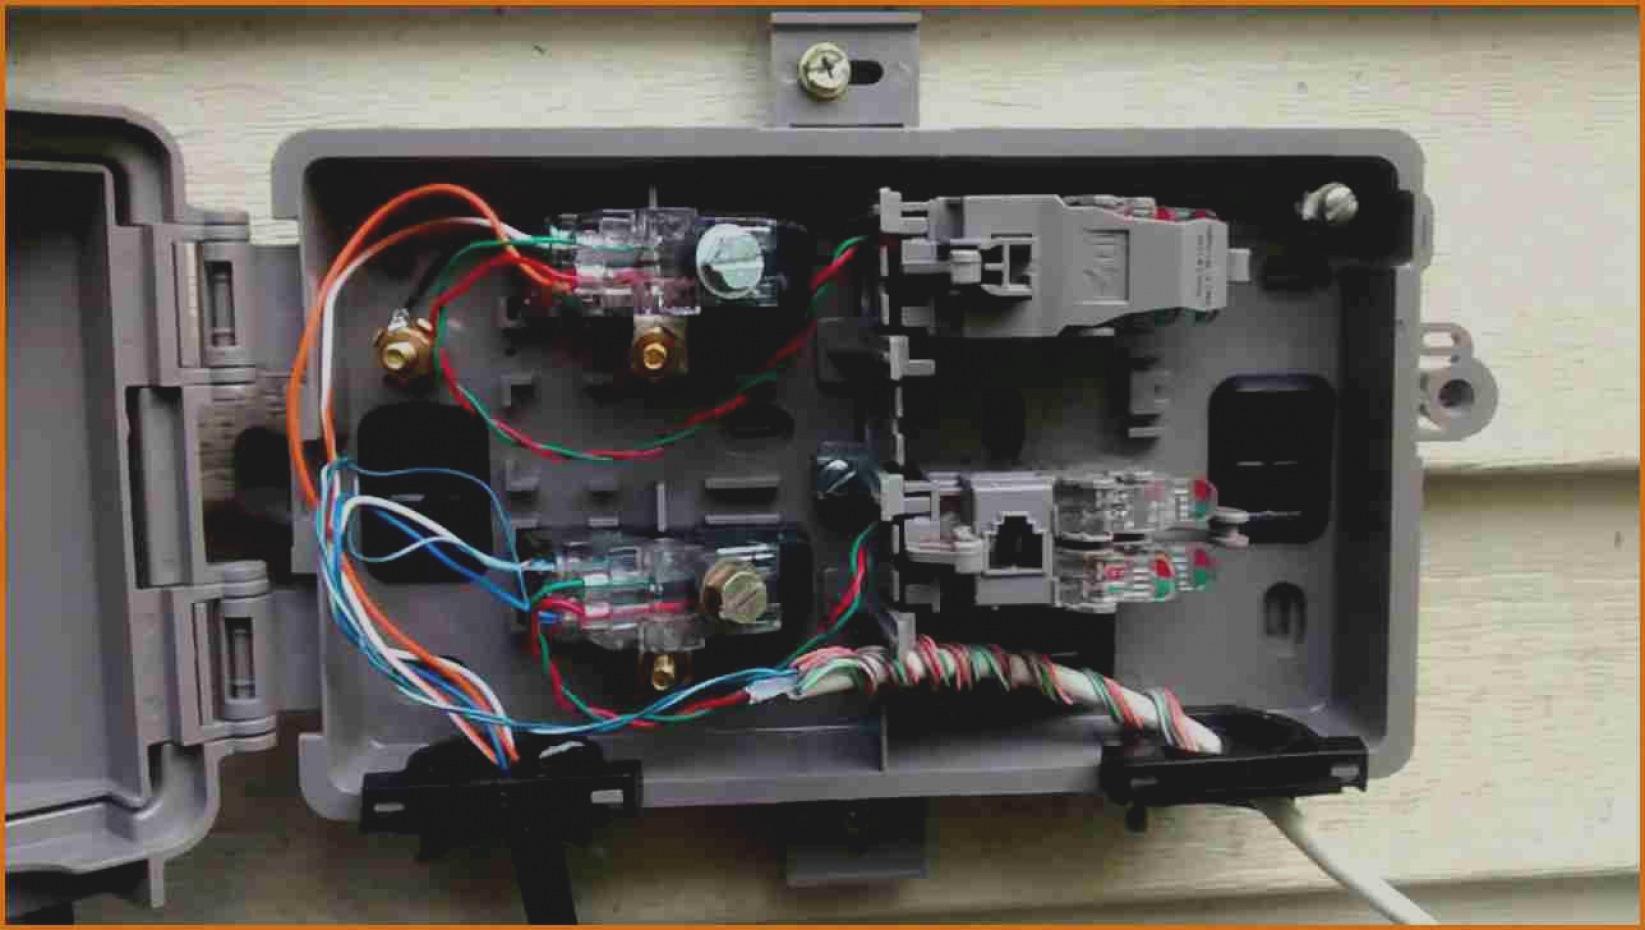 Telephone Interface Wiring Diagram   Wiring Diagram - Telephone Network Interface Wiring Diagram